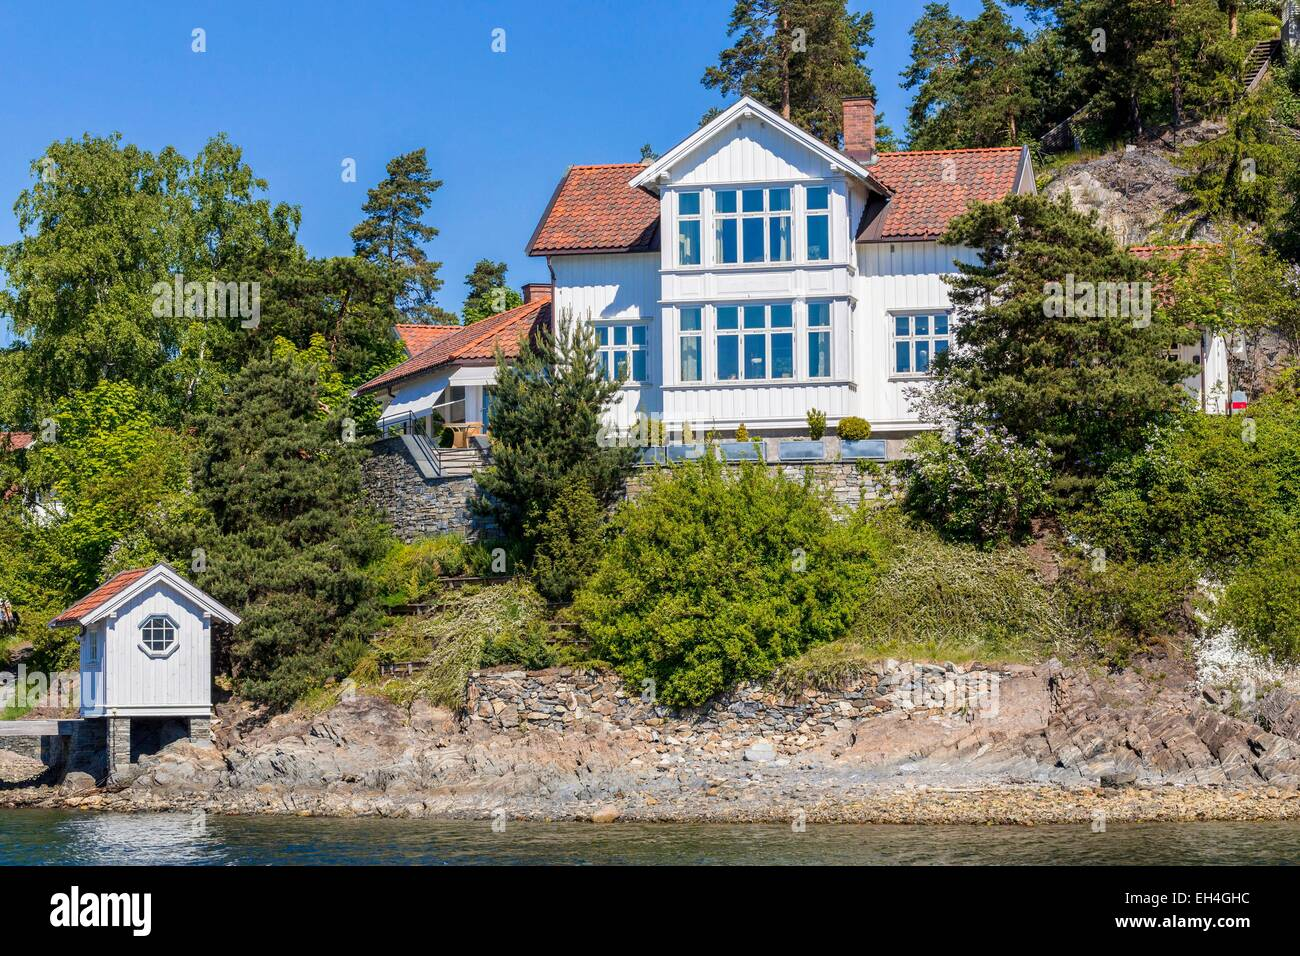 Norway, Oslo, Oslofjord, dwelling on one of the many islands Fjord - Stock Image